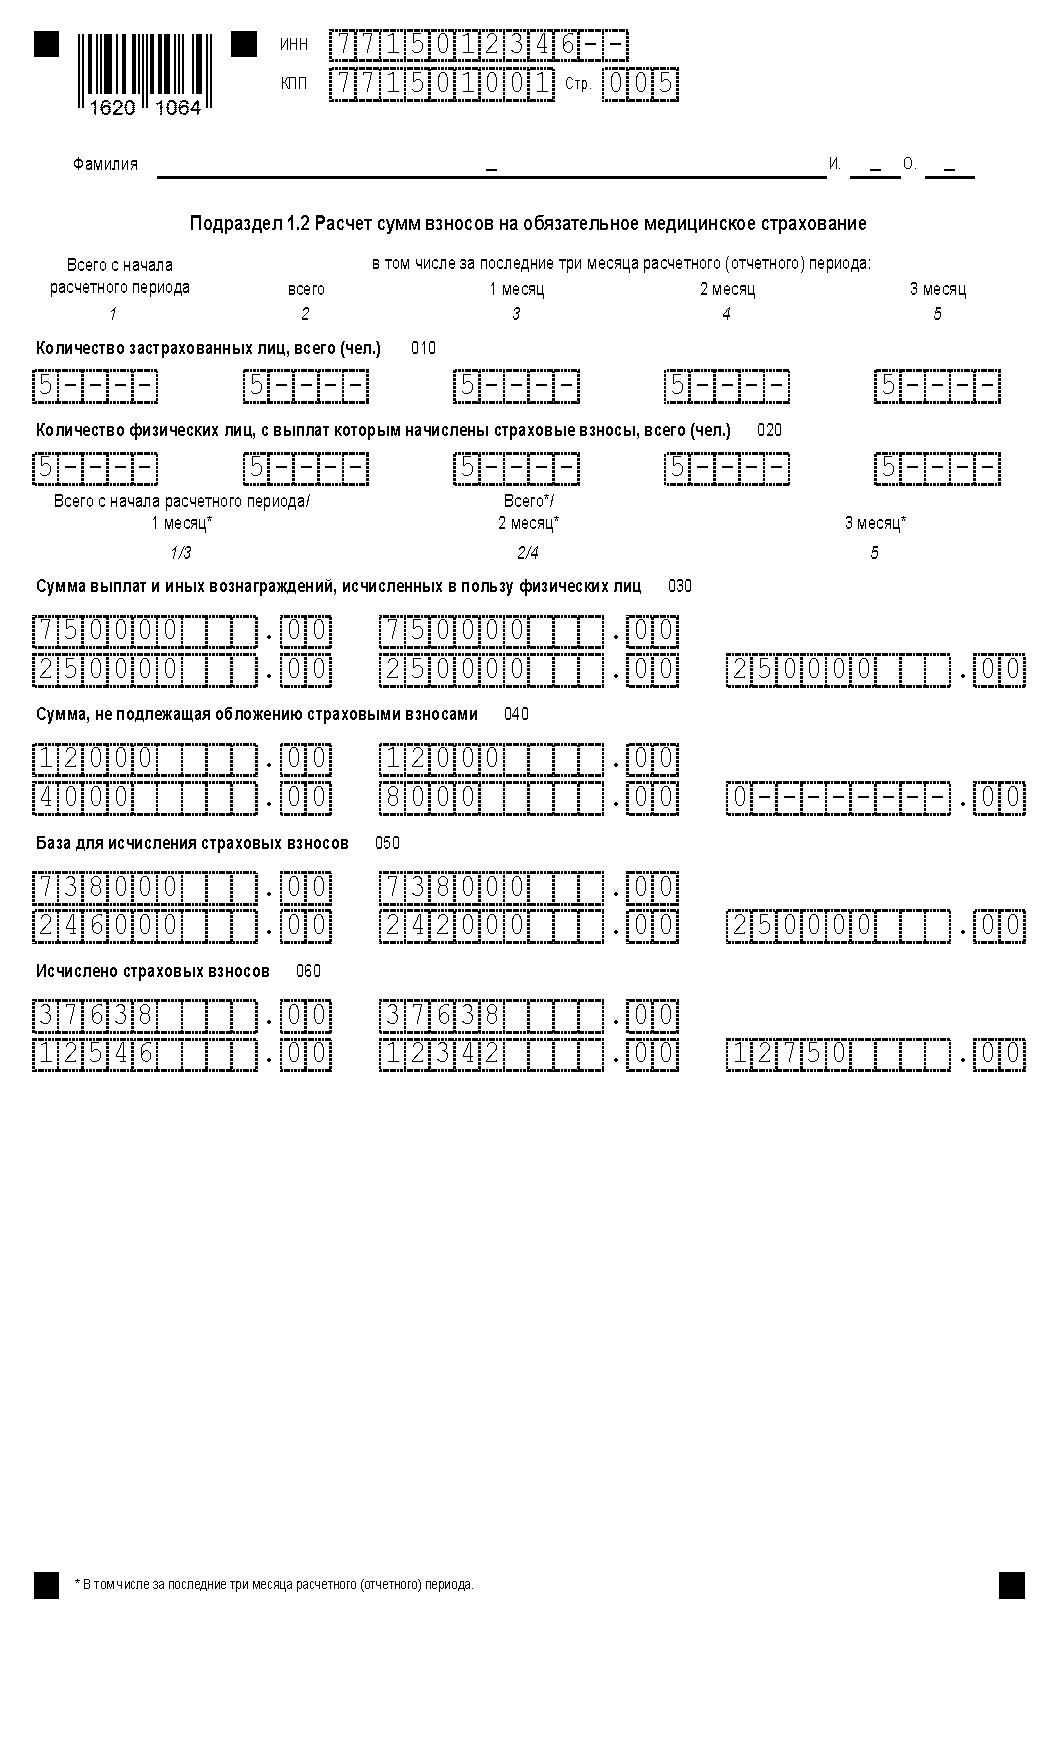 инструкция по заполнению рсв 1 за 1 квартал 2014 строка 100